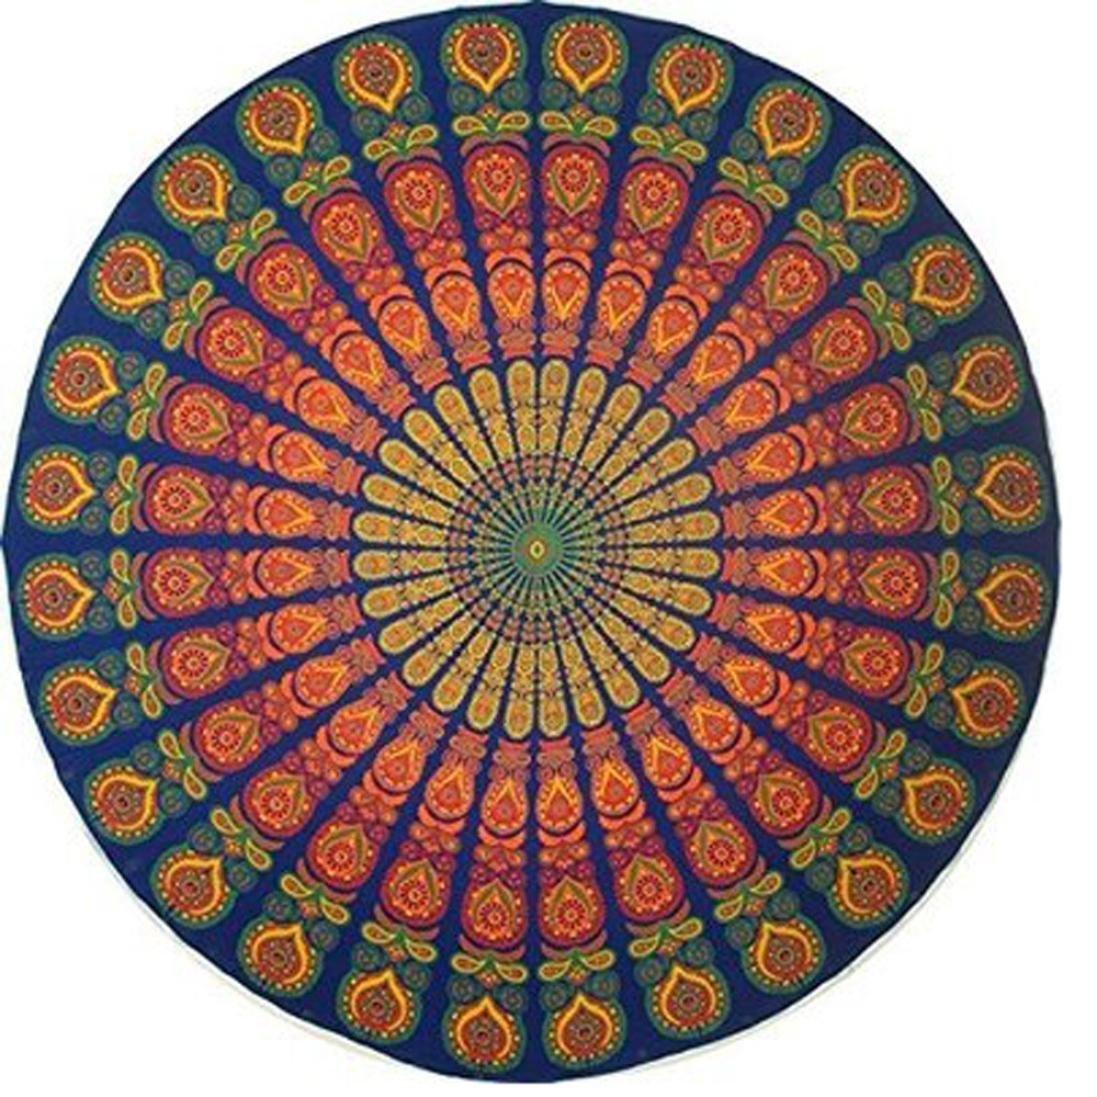 Bhagyoday fashions- indio Mandala redondo Roundie Beach manta tapiz, Hippie Boho Gypsy toalla de playa, Roundie toalla, toalla de, extragrande redonda para ...